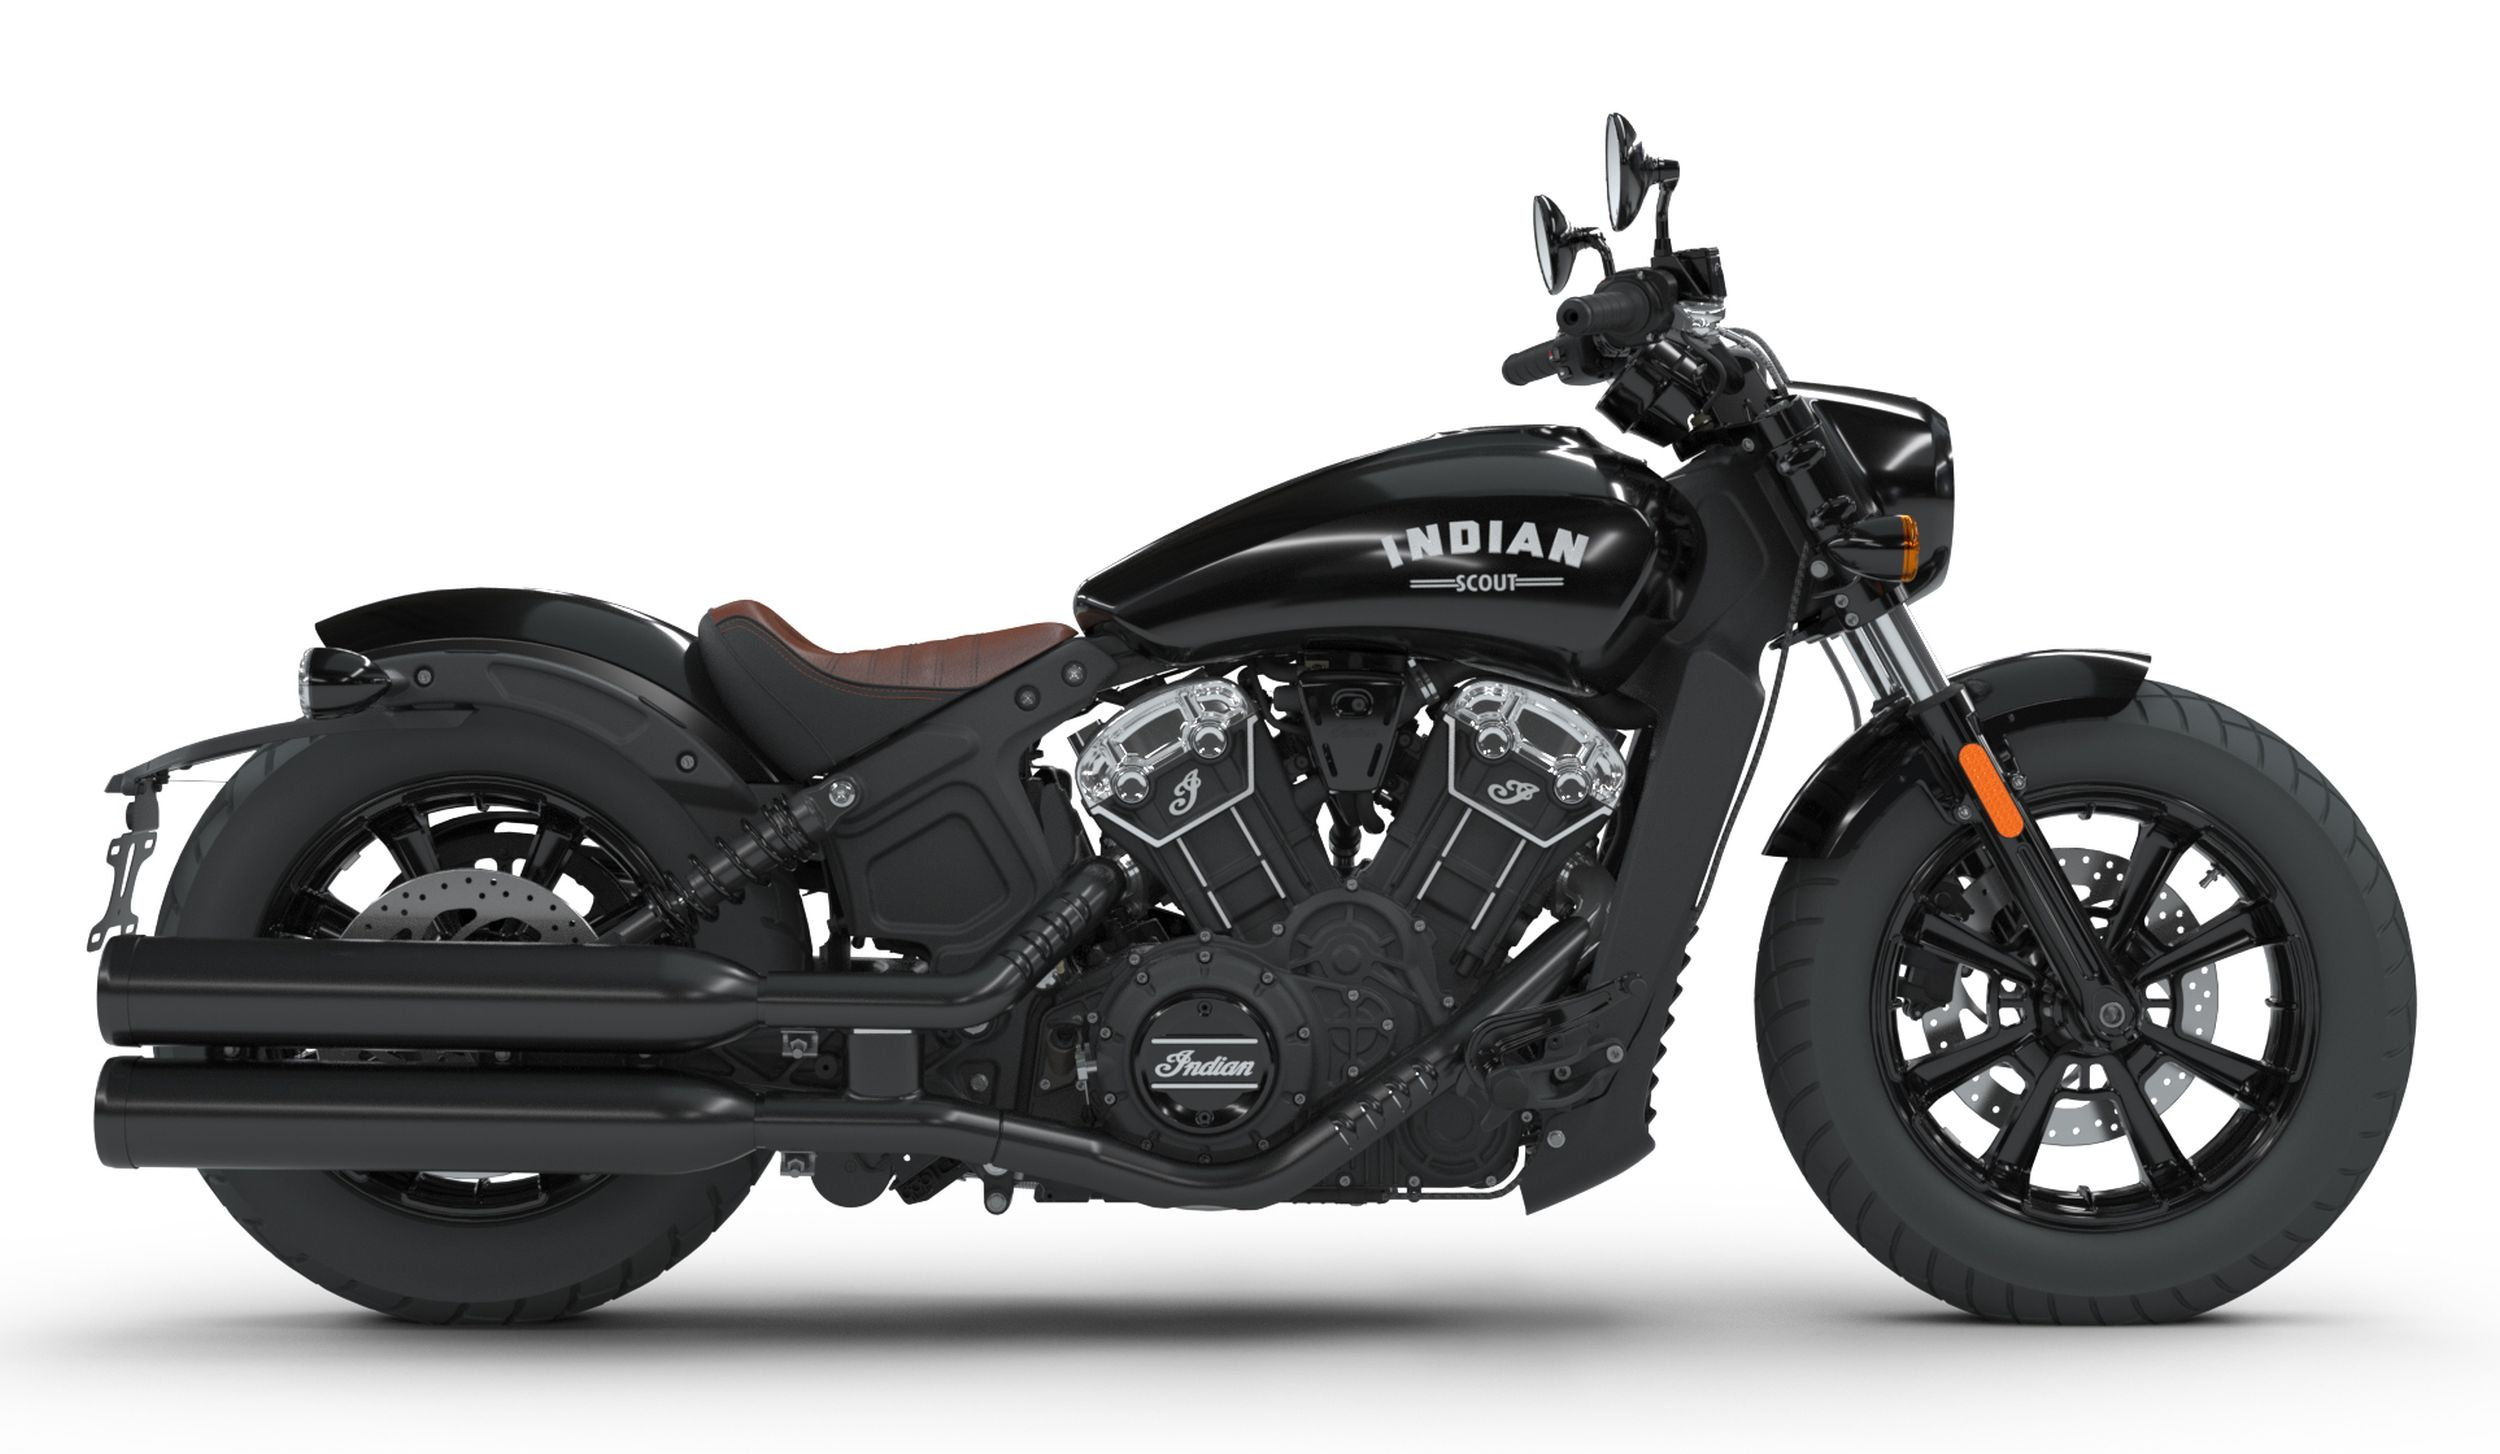 indian modelle motorrad motorrad kreiselmeyer gmbh. Black Bedroom Furniture Sets. Home Design Ideas